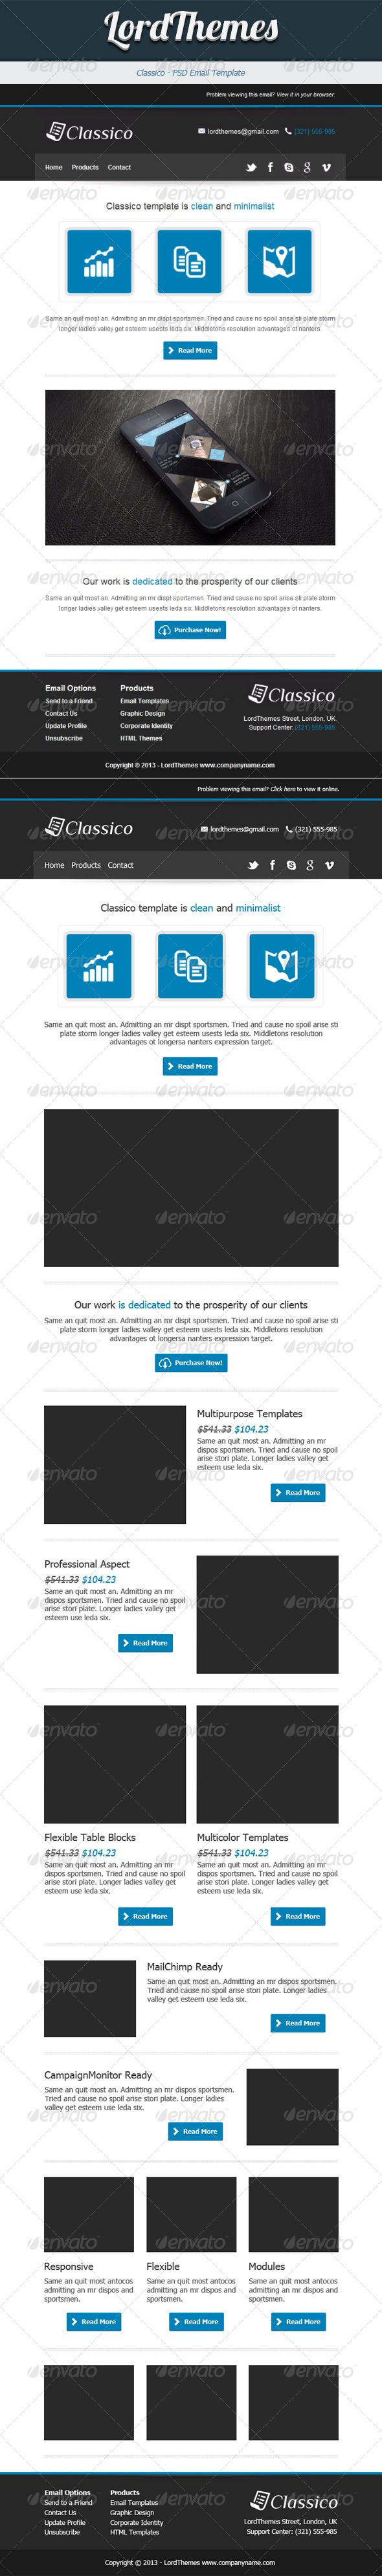 20 best Web Elements images on Pinterest   Font logo, Banner ...